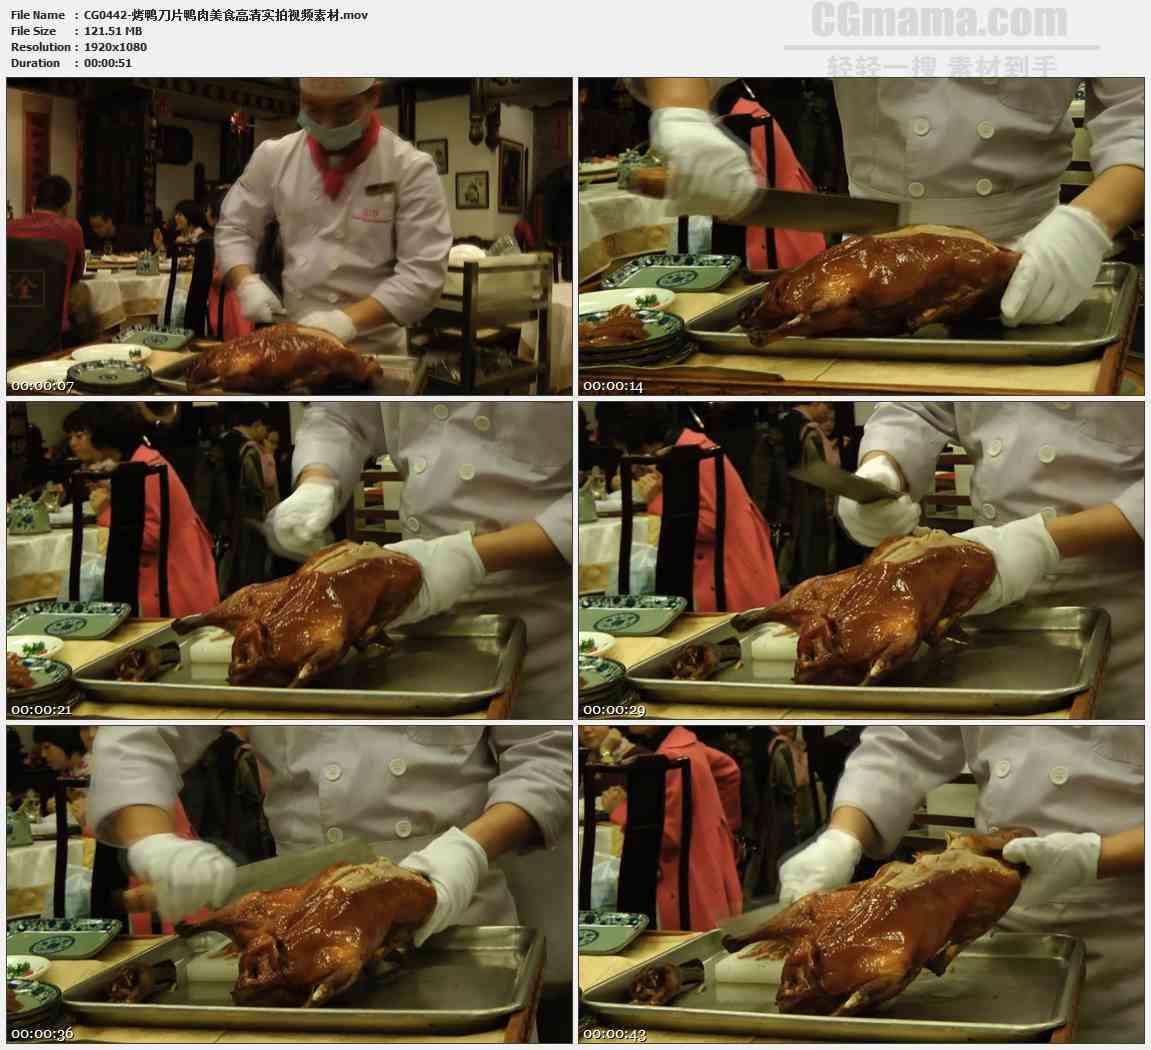 CG0442-烤鸭刀片鸭肉美食高清实拍视频素材